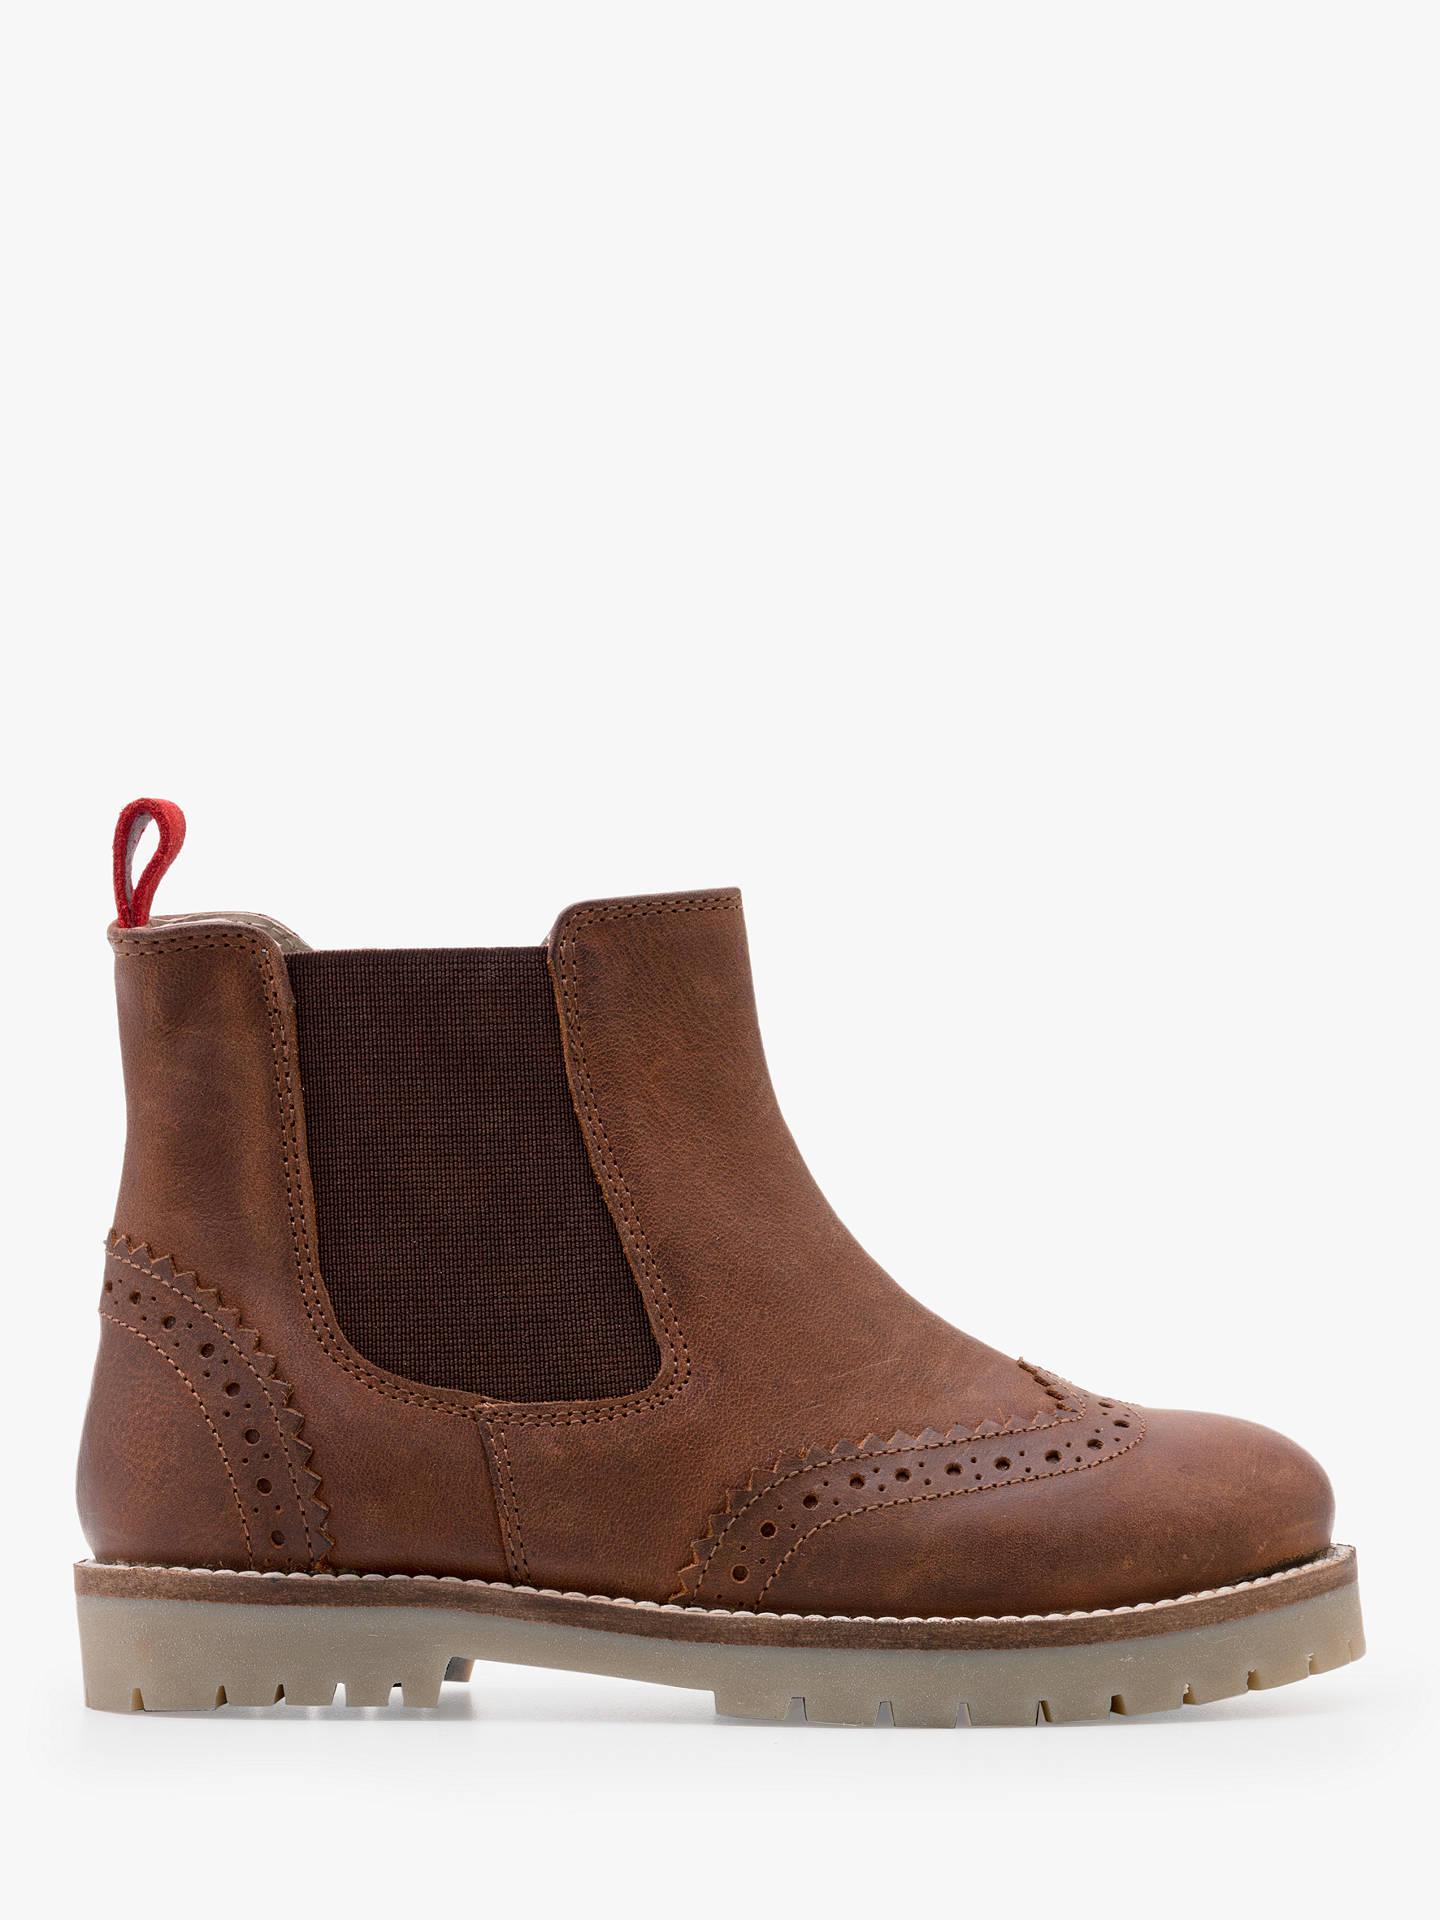 Mini Boden Children S Leather Chelsea Boots Tan At John